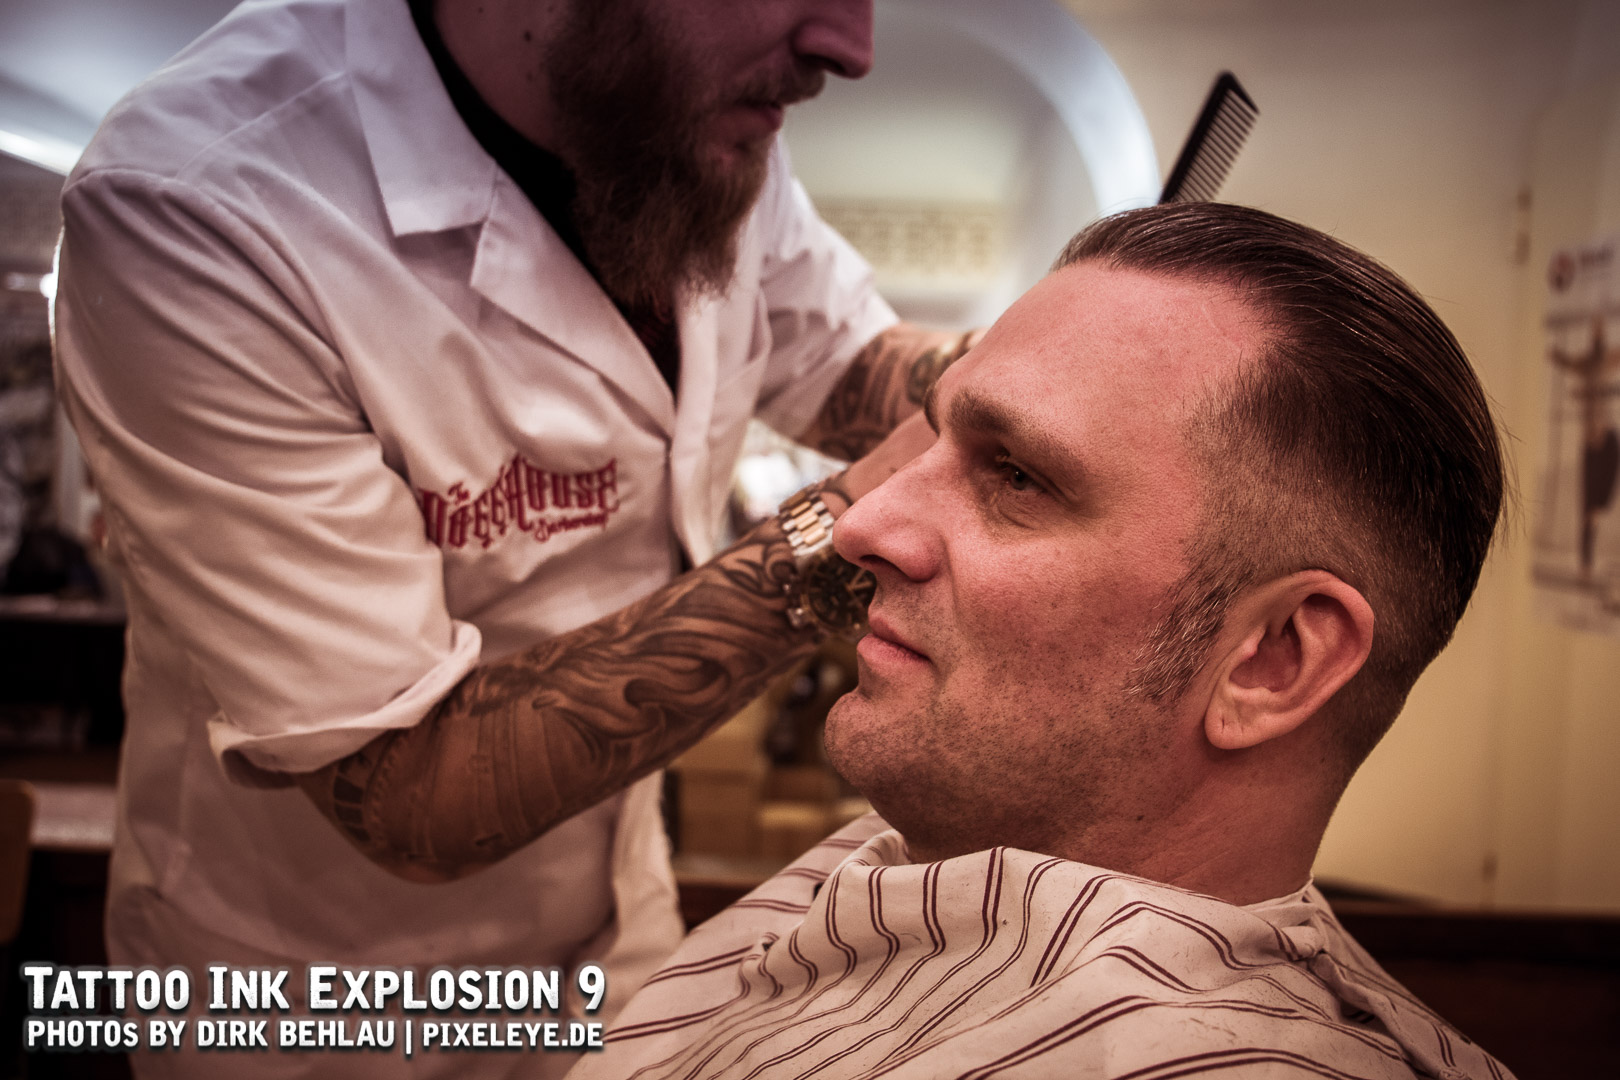 Tattoo Ink Explosion 2018 WEB by Dirk Behlau-0221.jpg